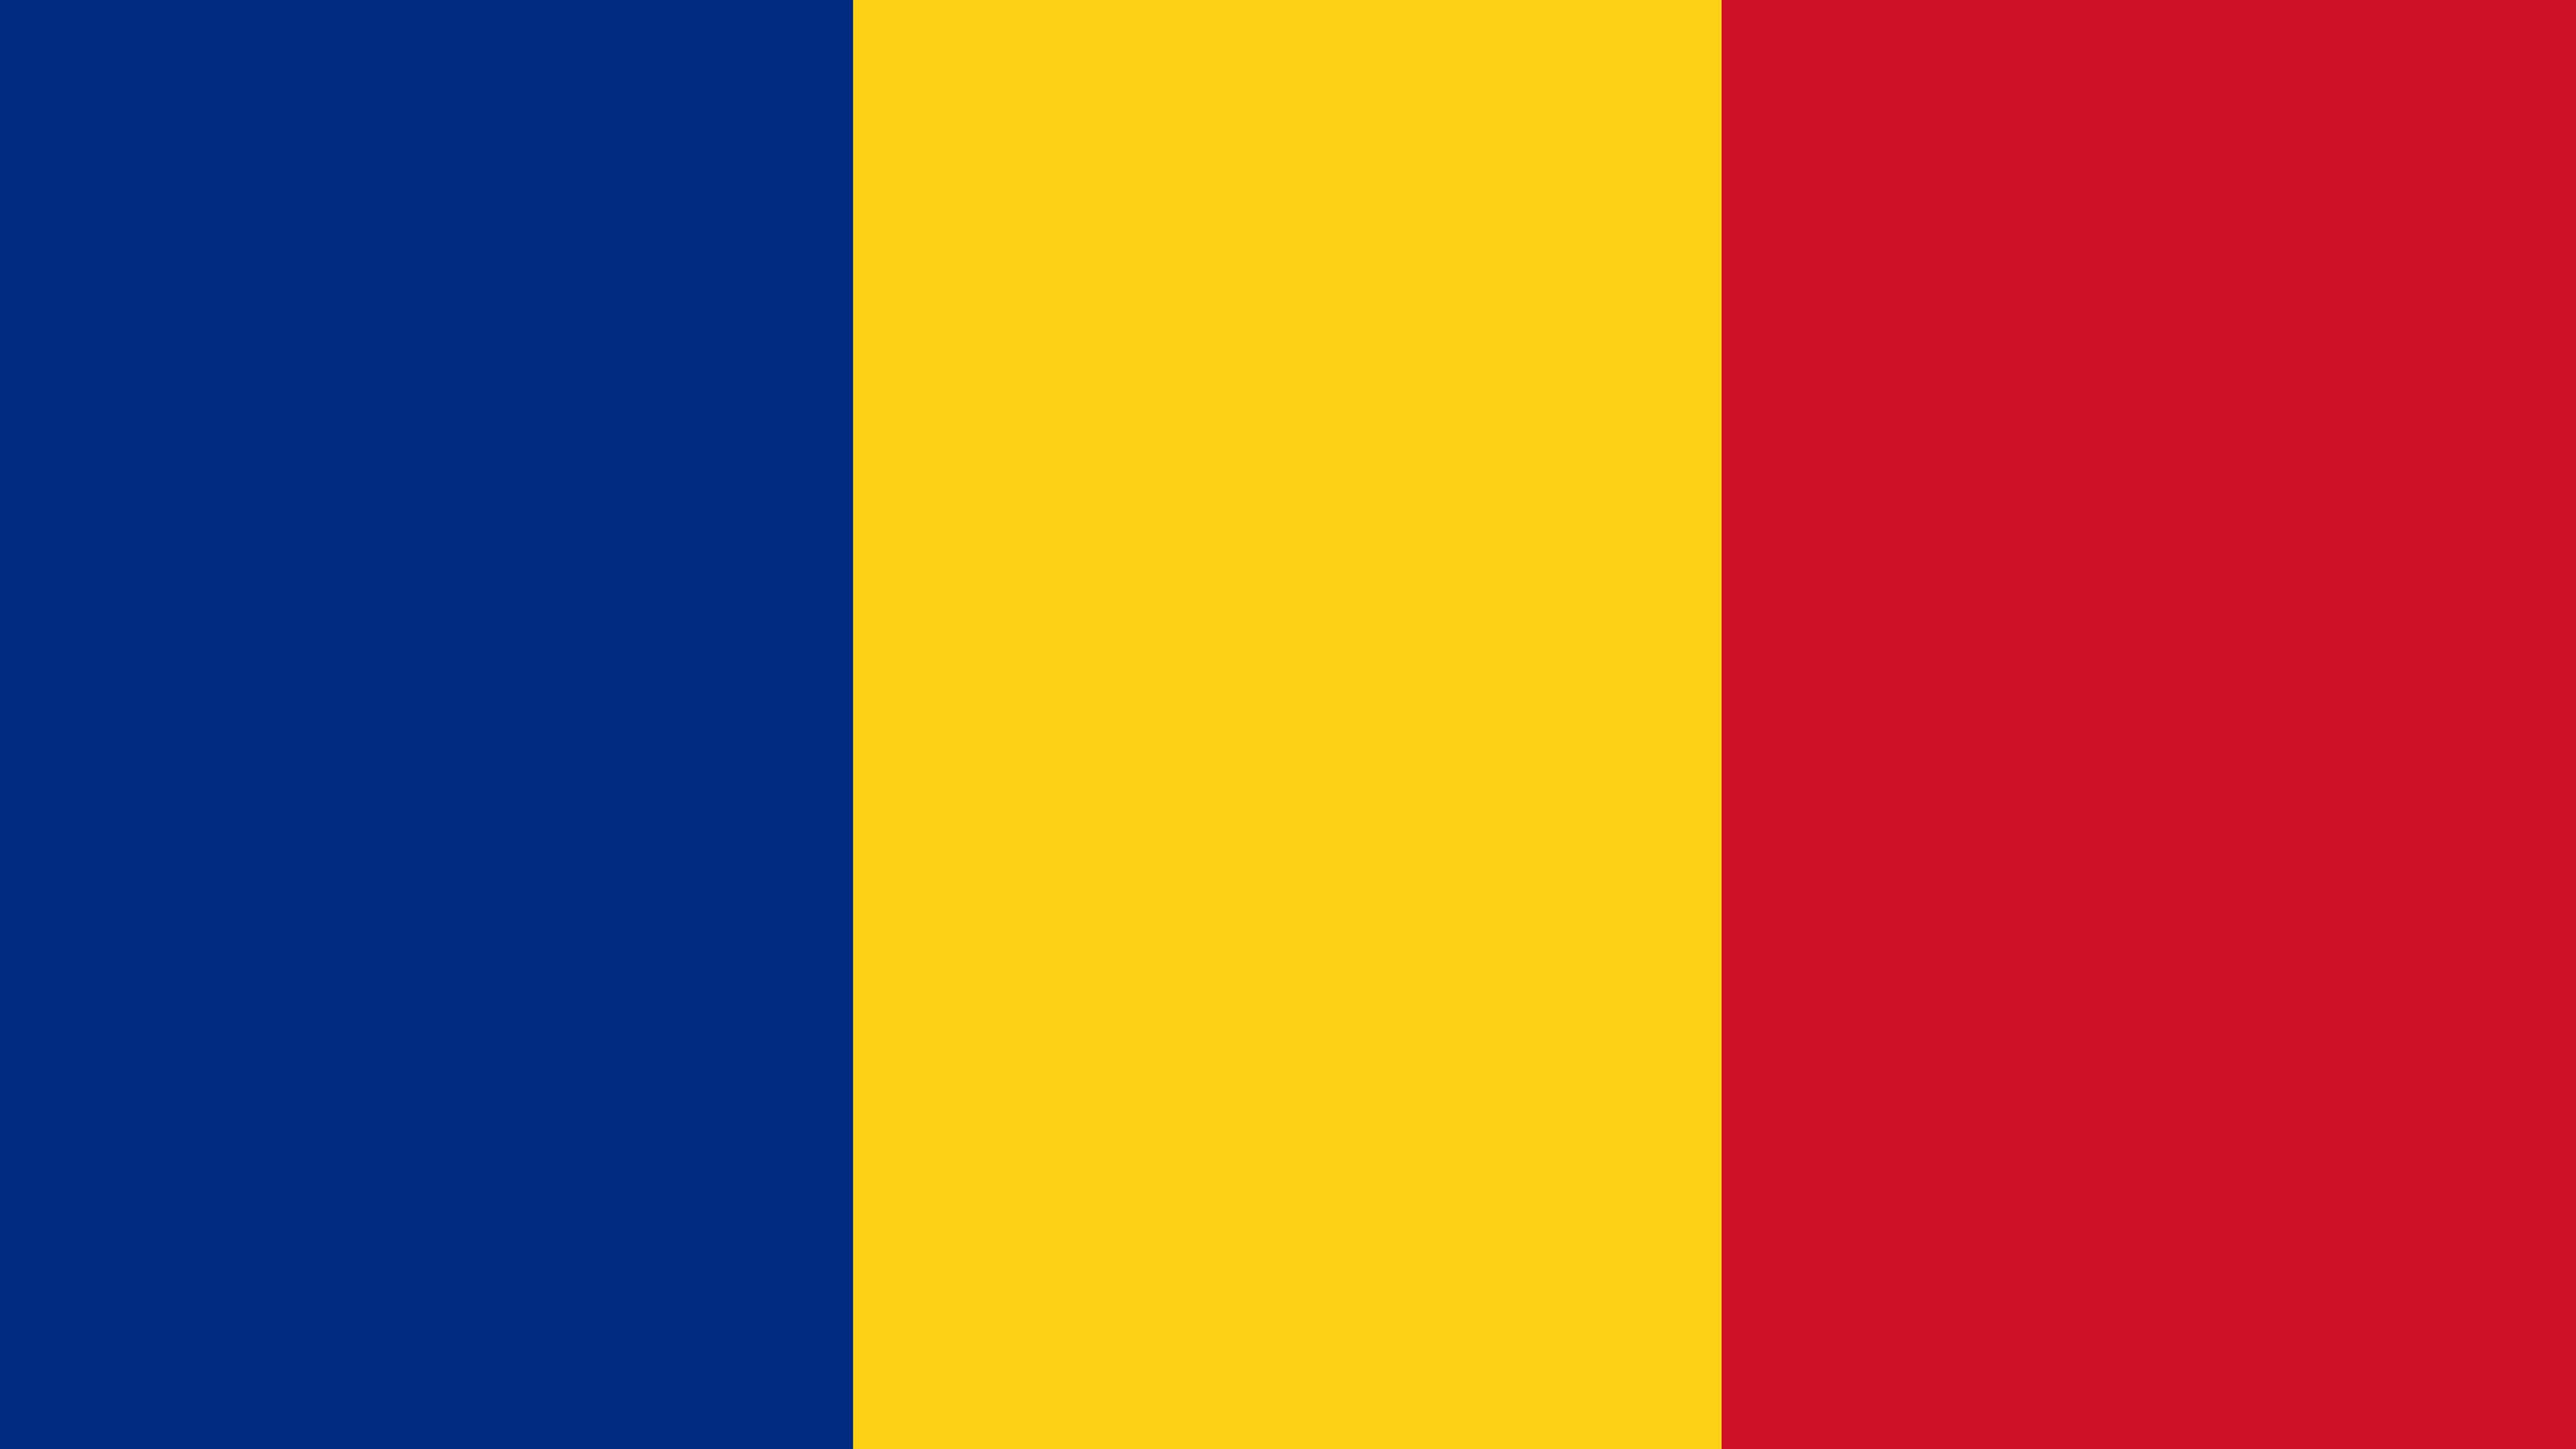 romania flag uhd 4k wallpaper